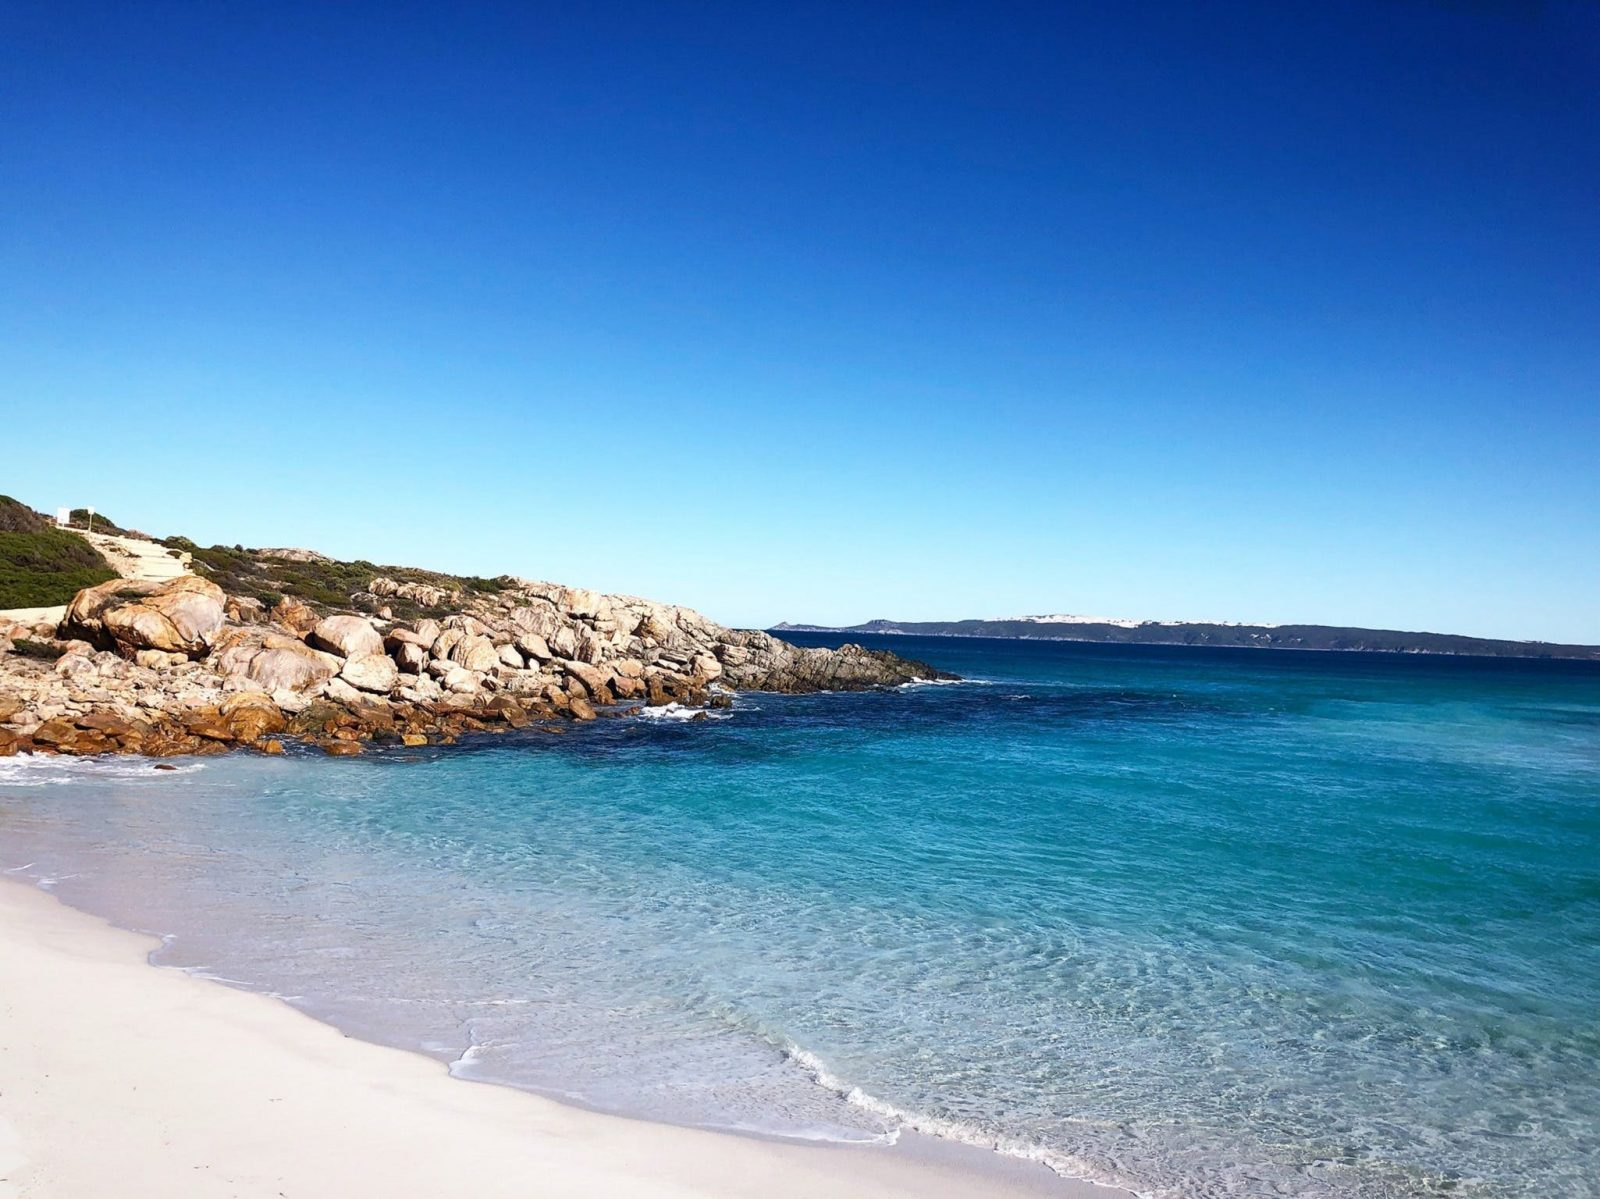 Bremer Bay Resort, Bremer Bay, Western Australia